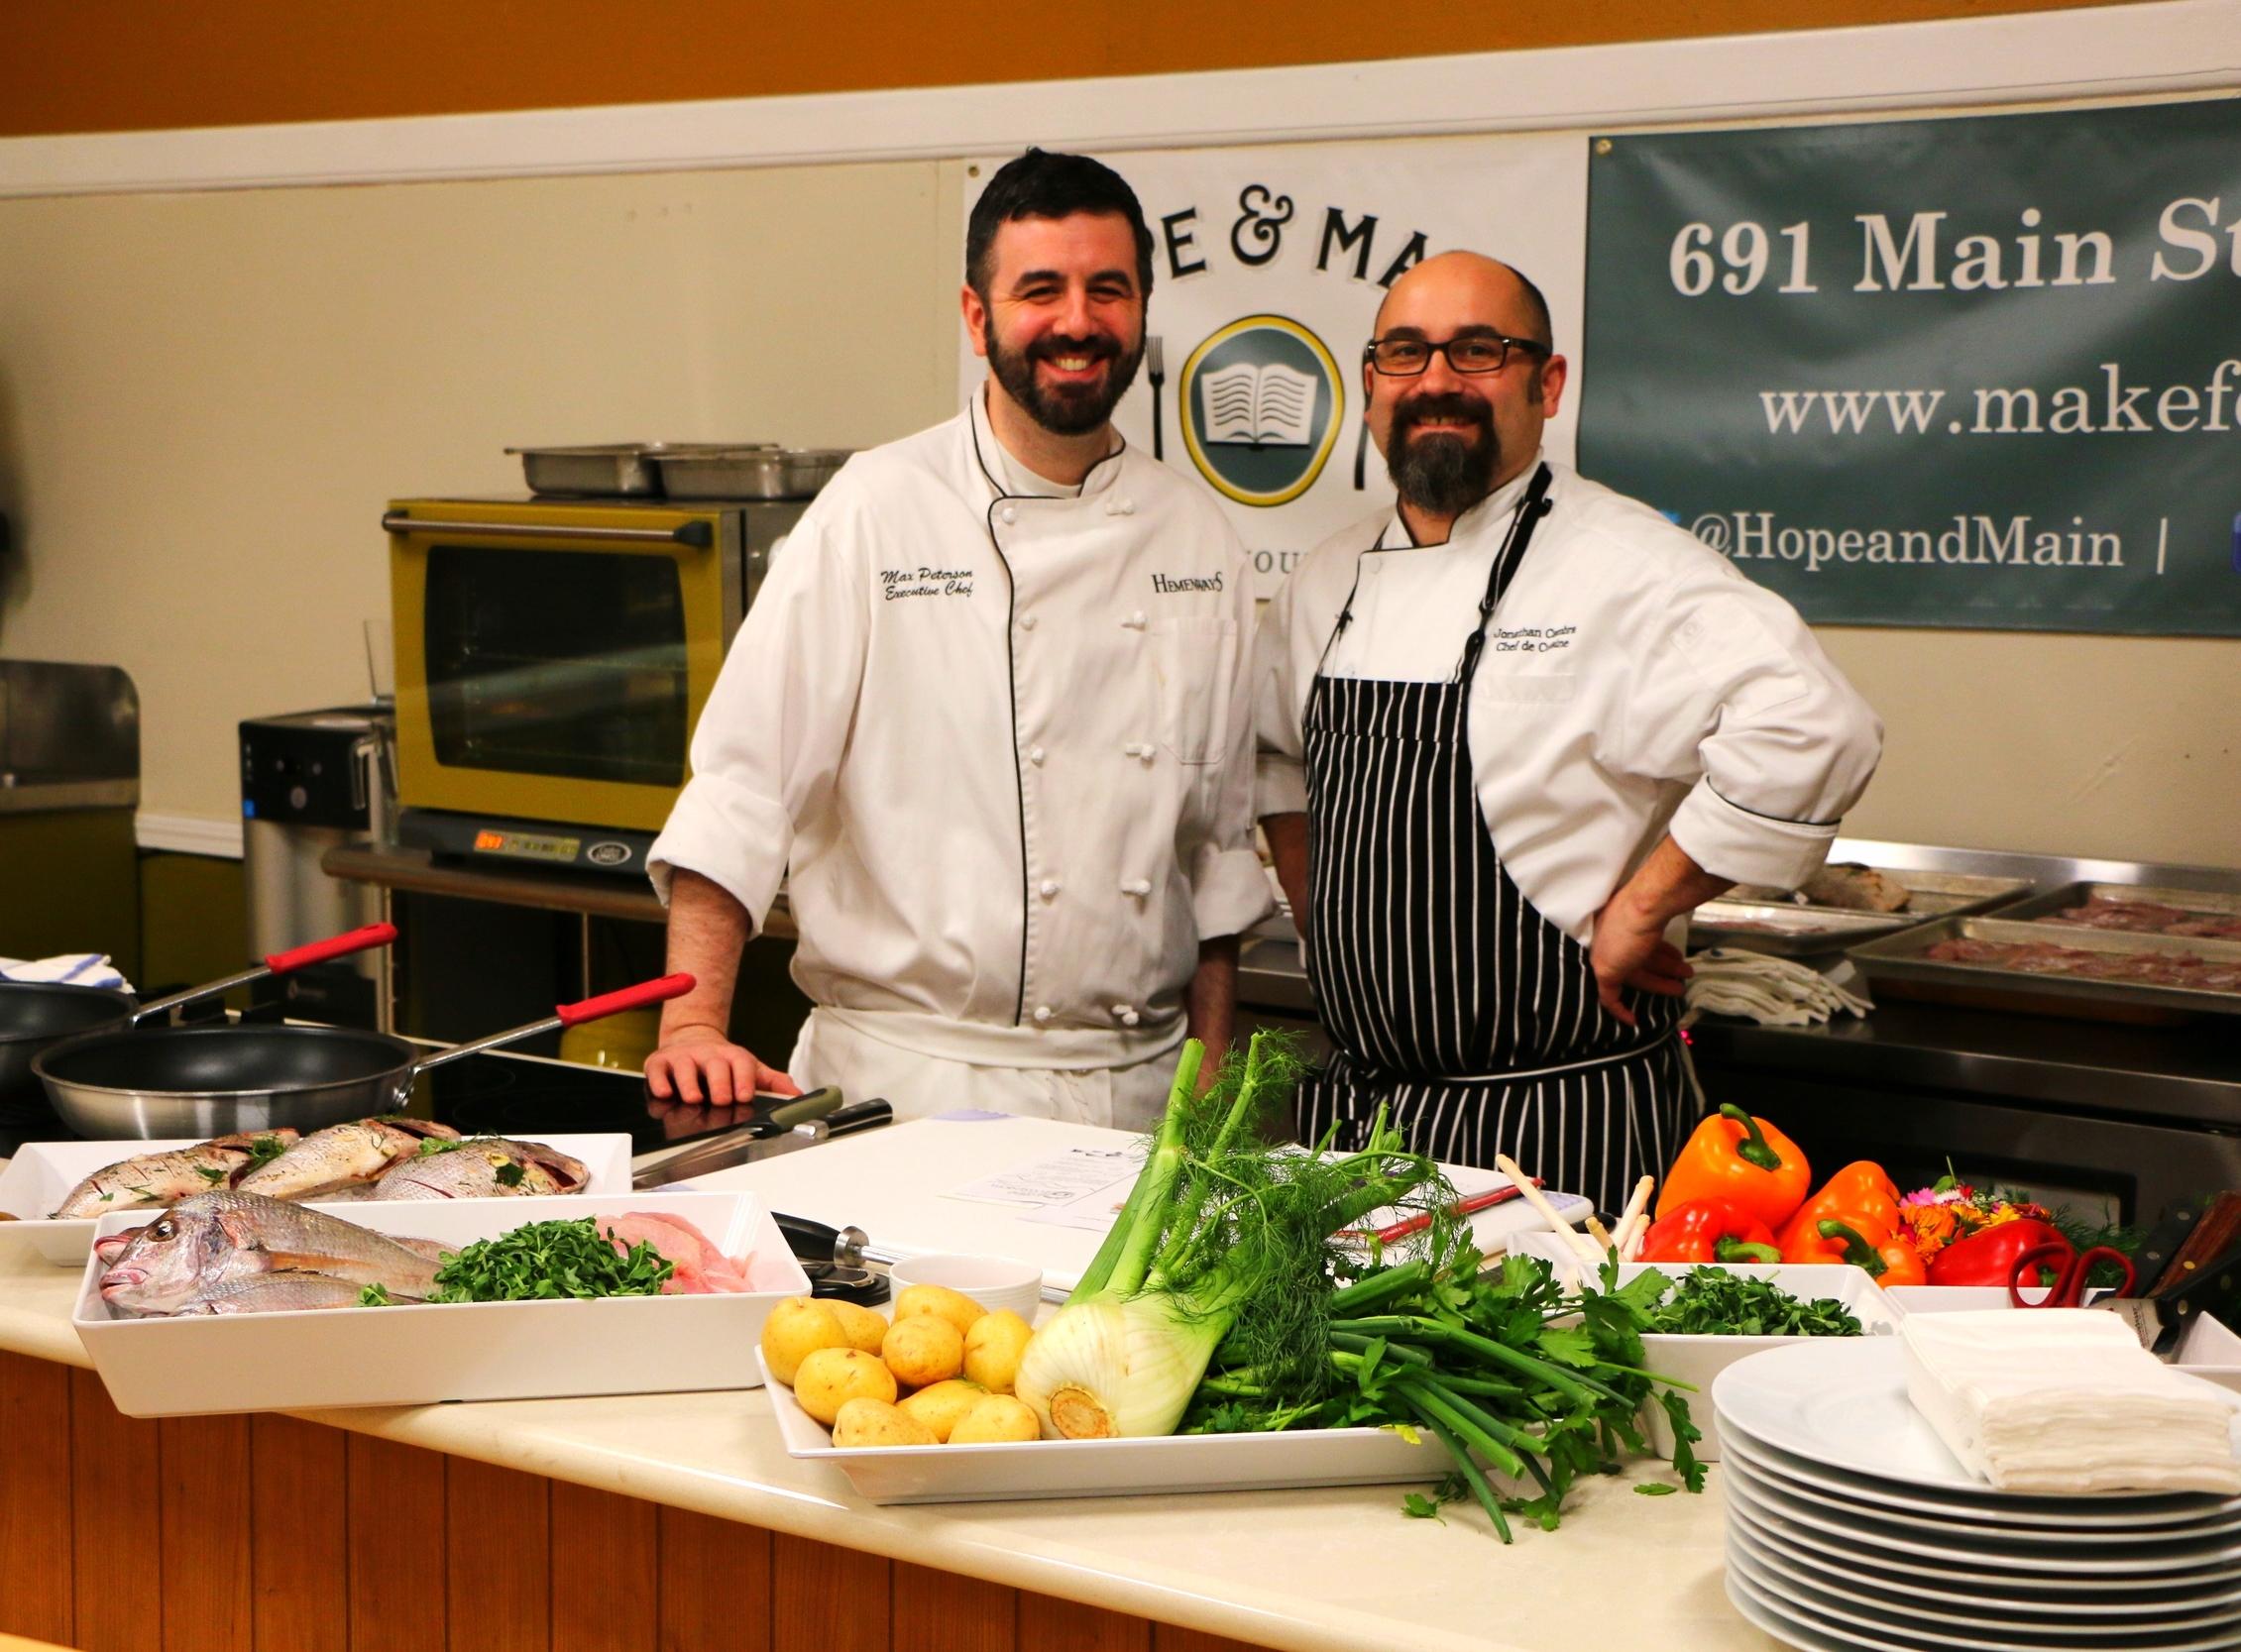 Chef Max Peterson and Jonathan Cambra